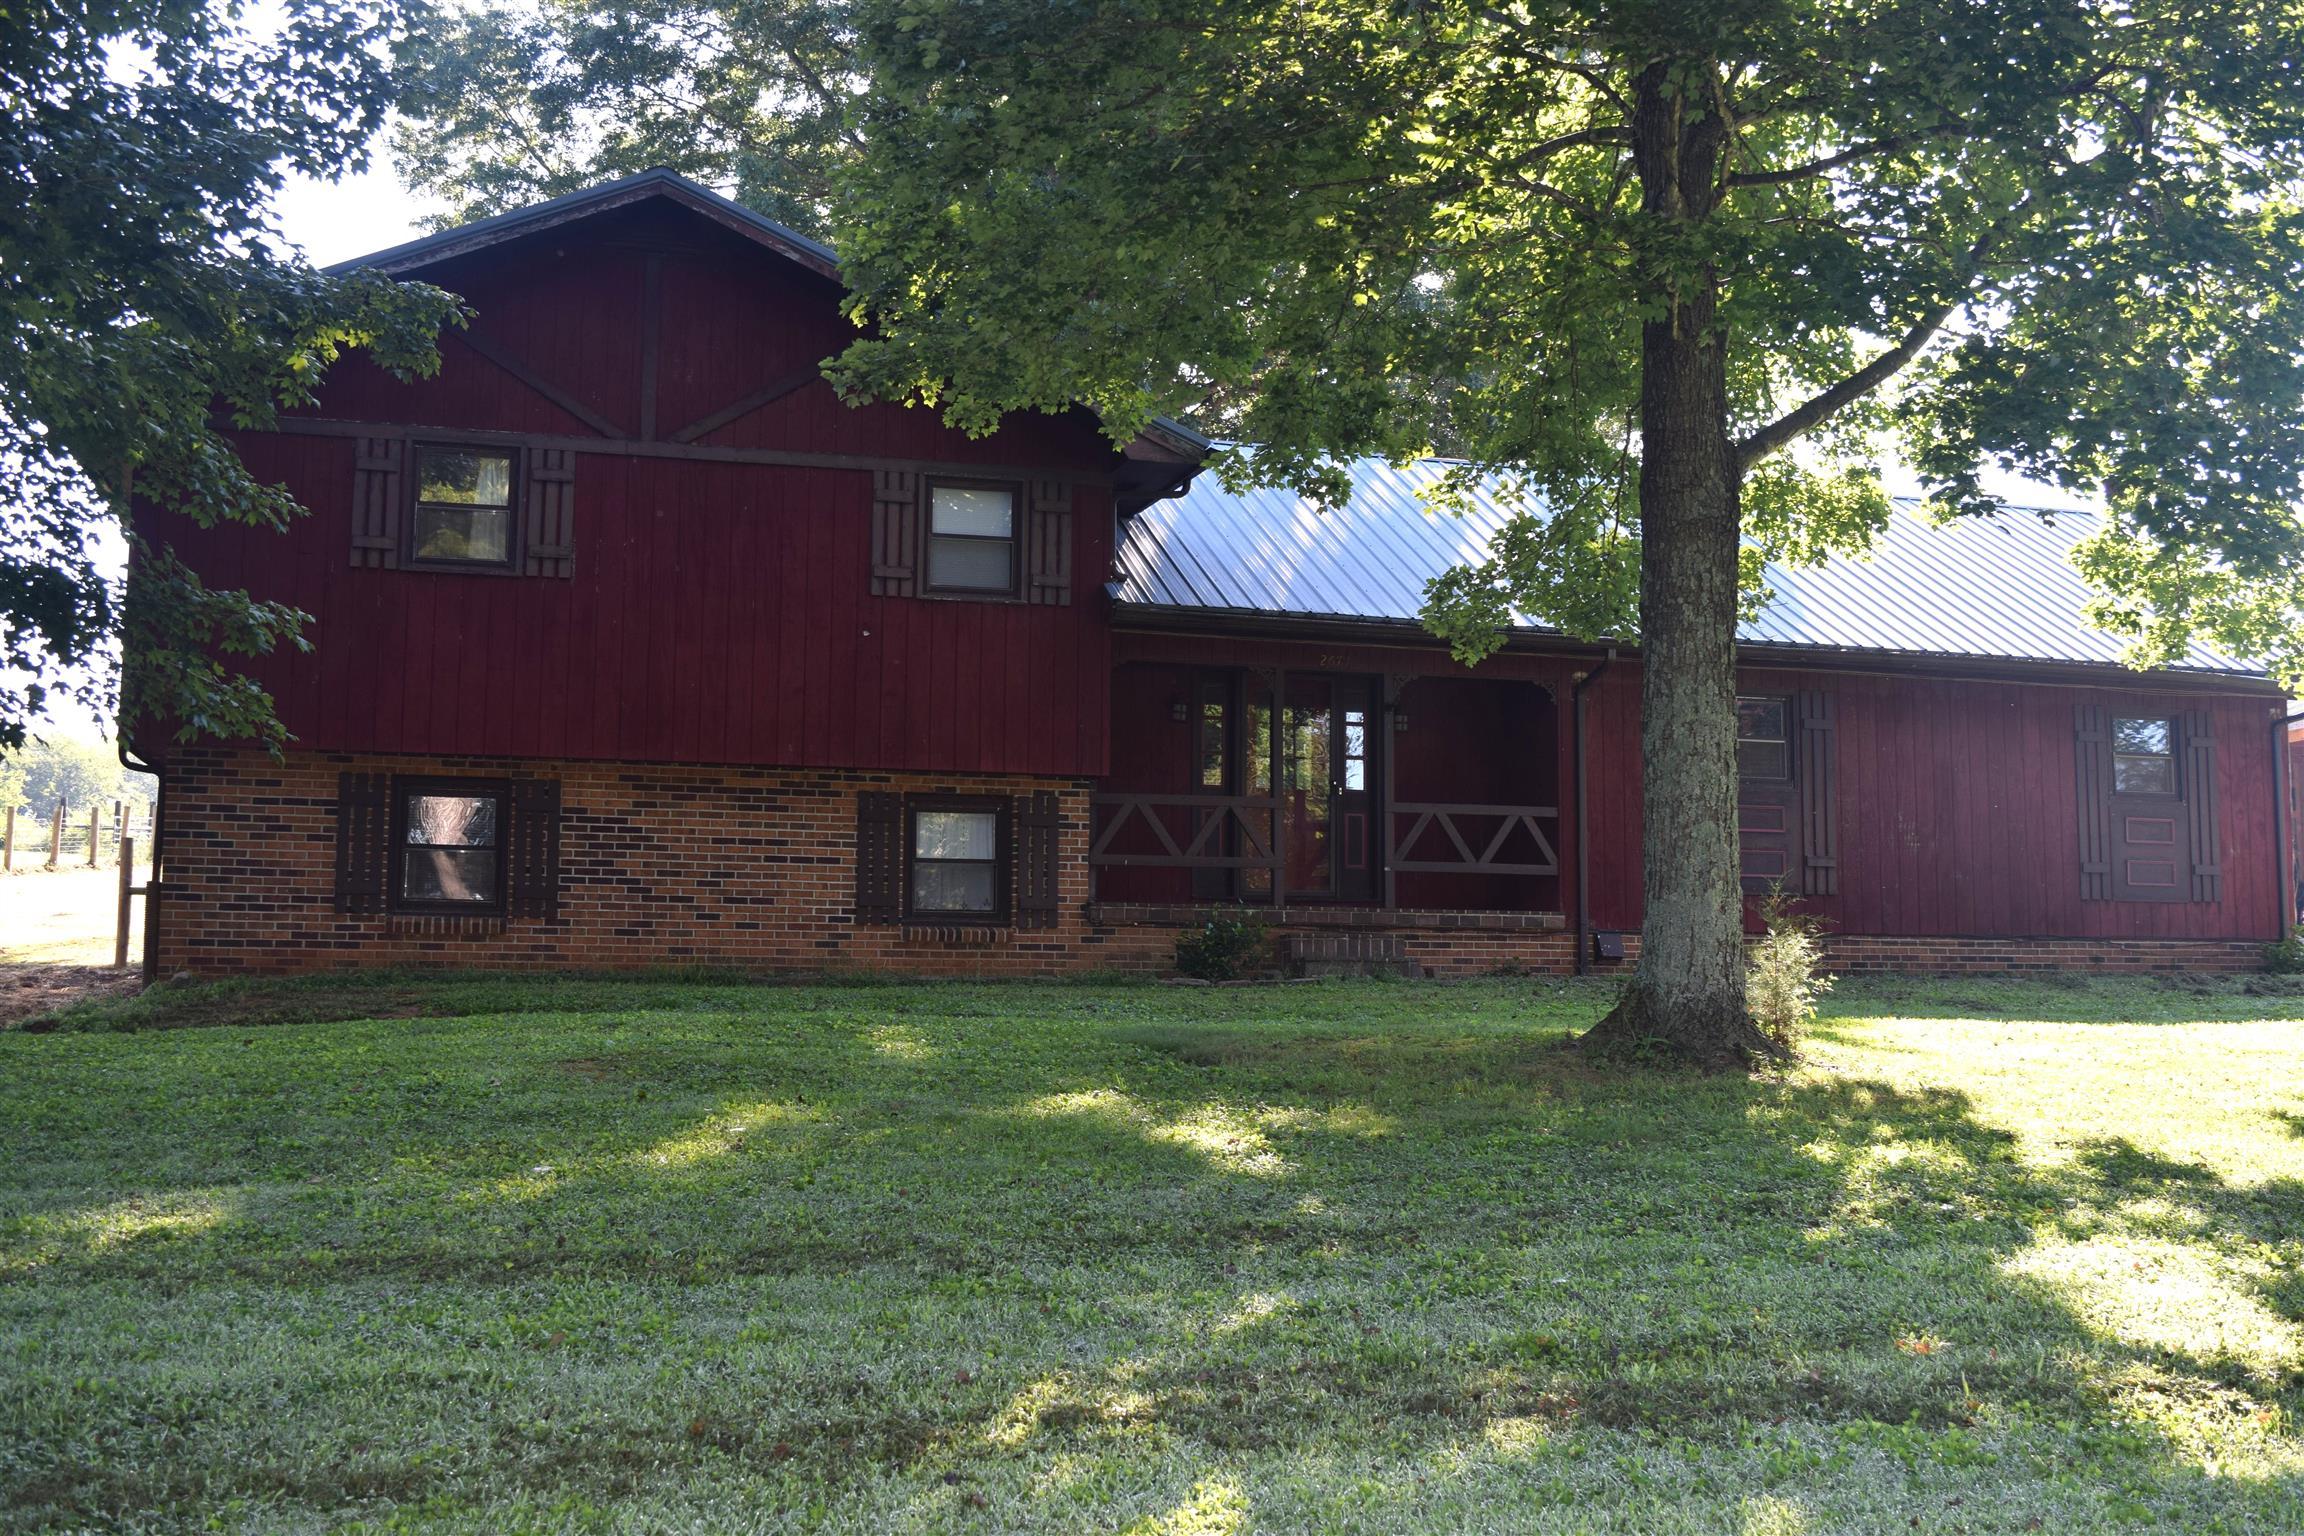 2671 Morrison Viola Rd, Morrison, TN 37357 - Morrison, TN real estate listing